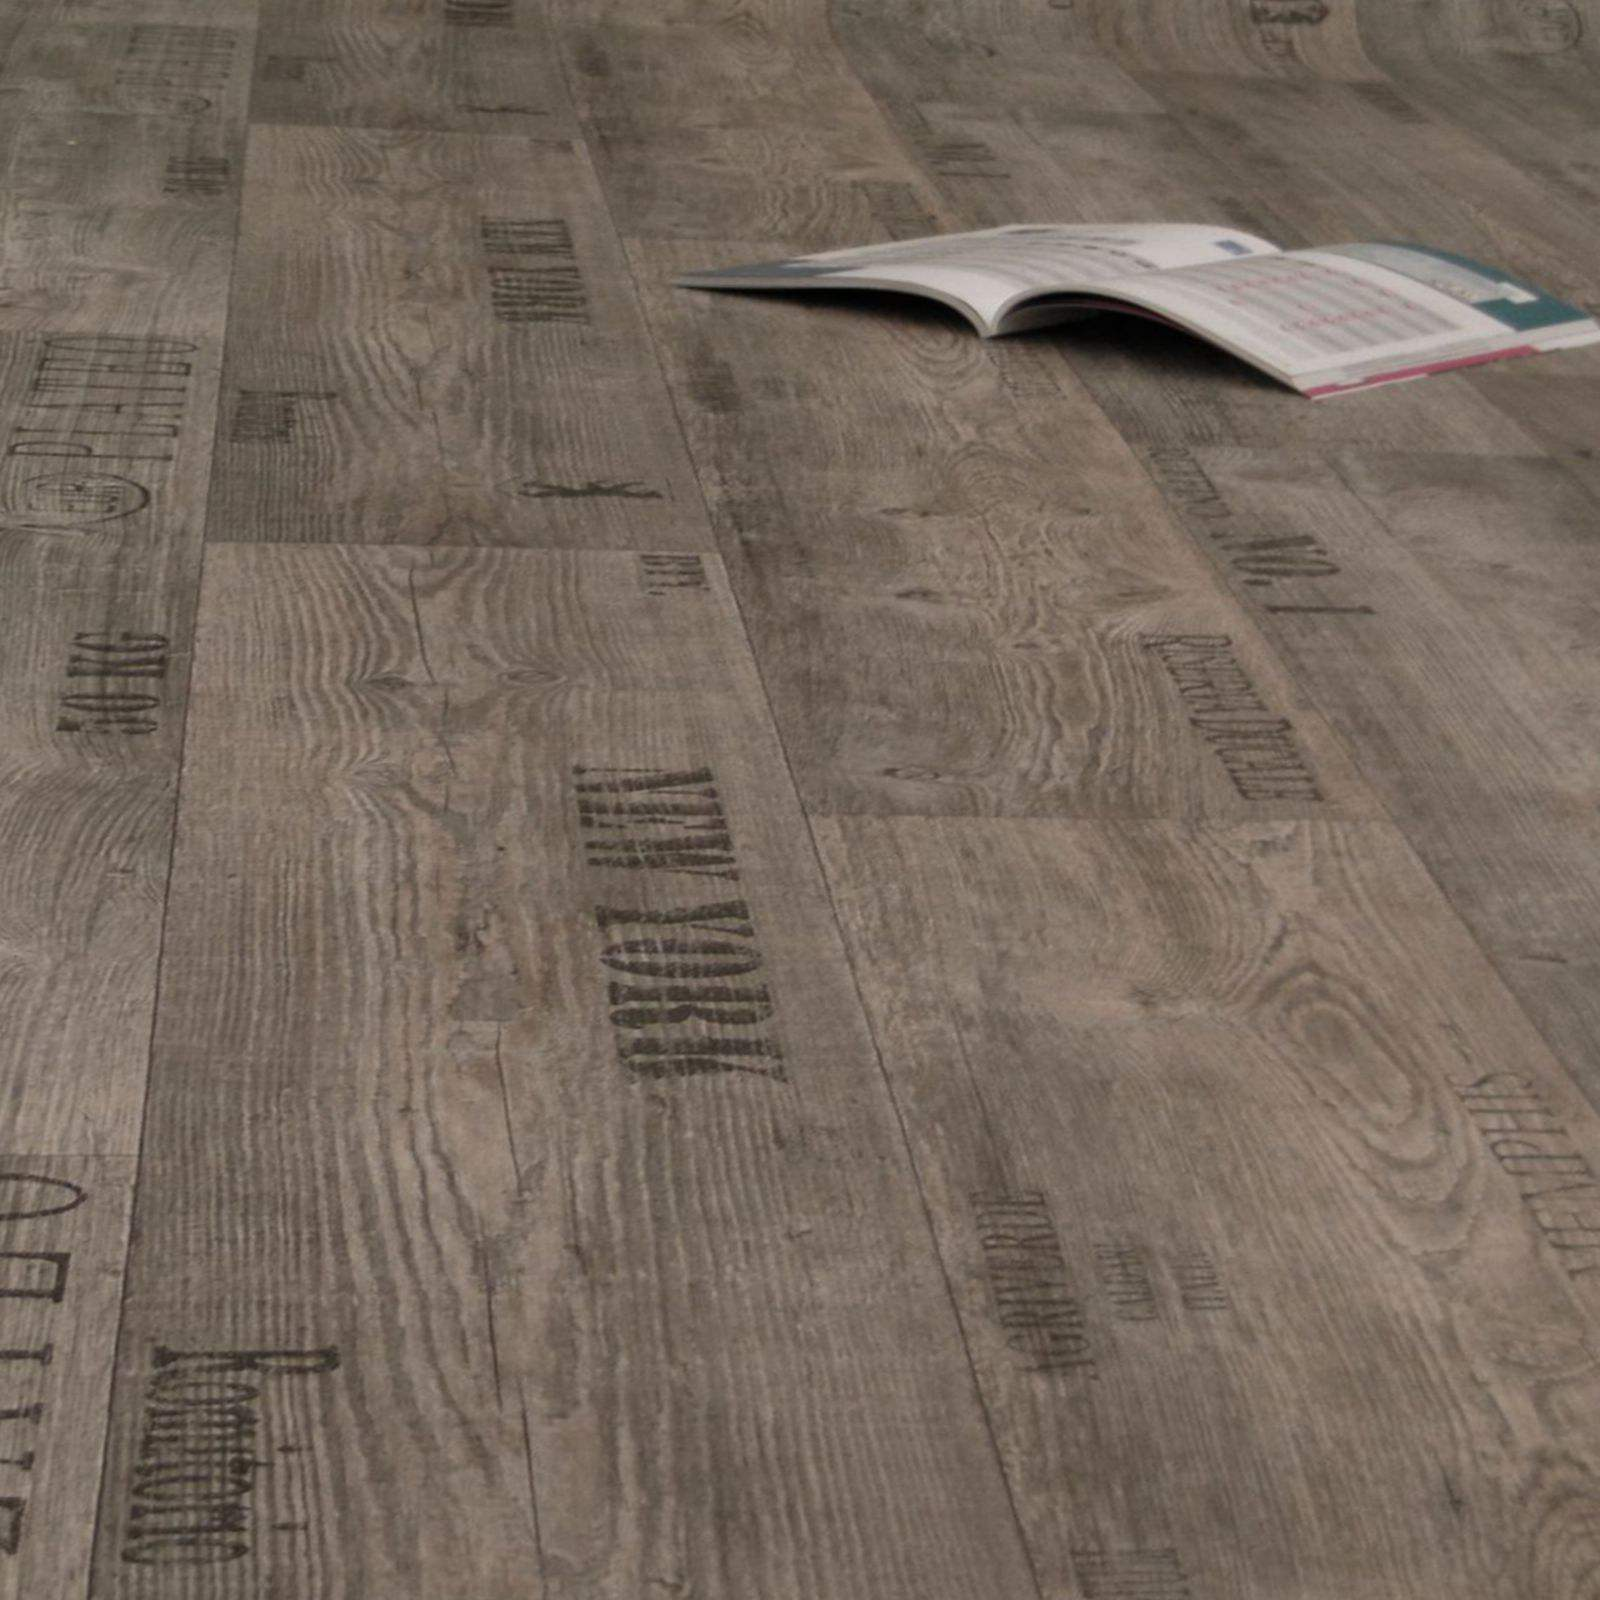 pvc bodenbelag rustikal grau mit aufdruck | holz | pvc / cv beläge